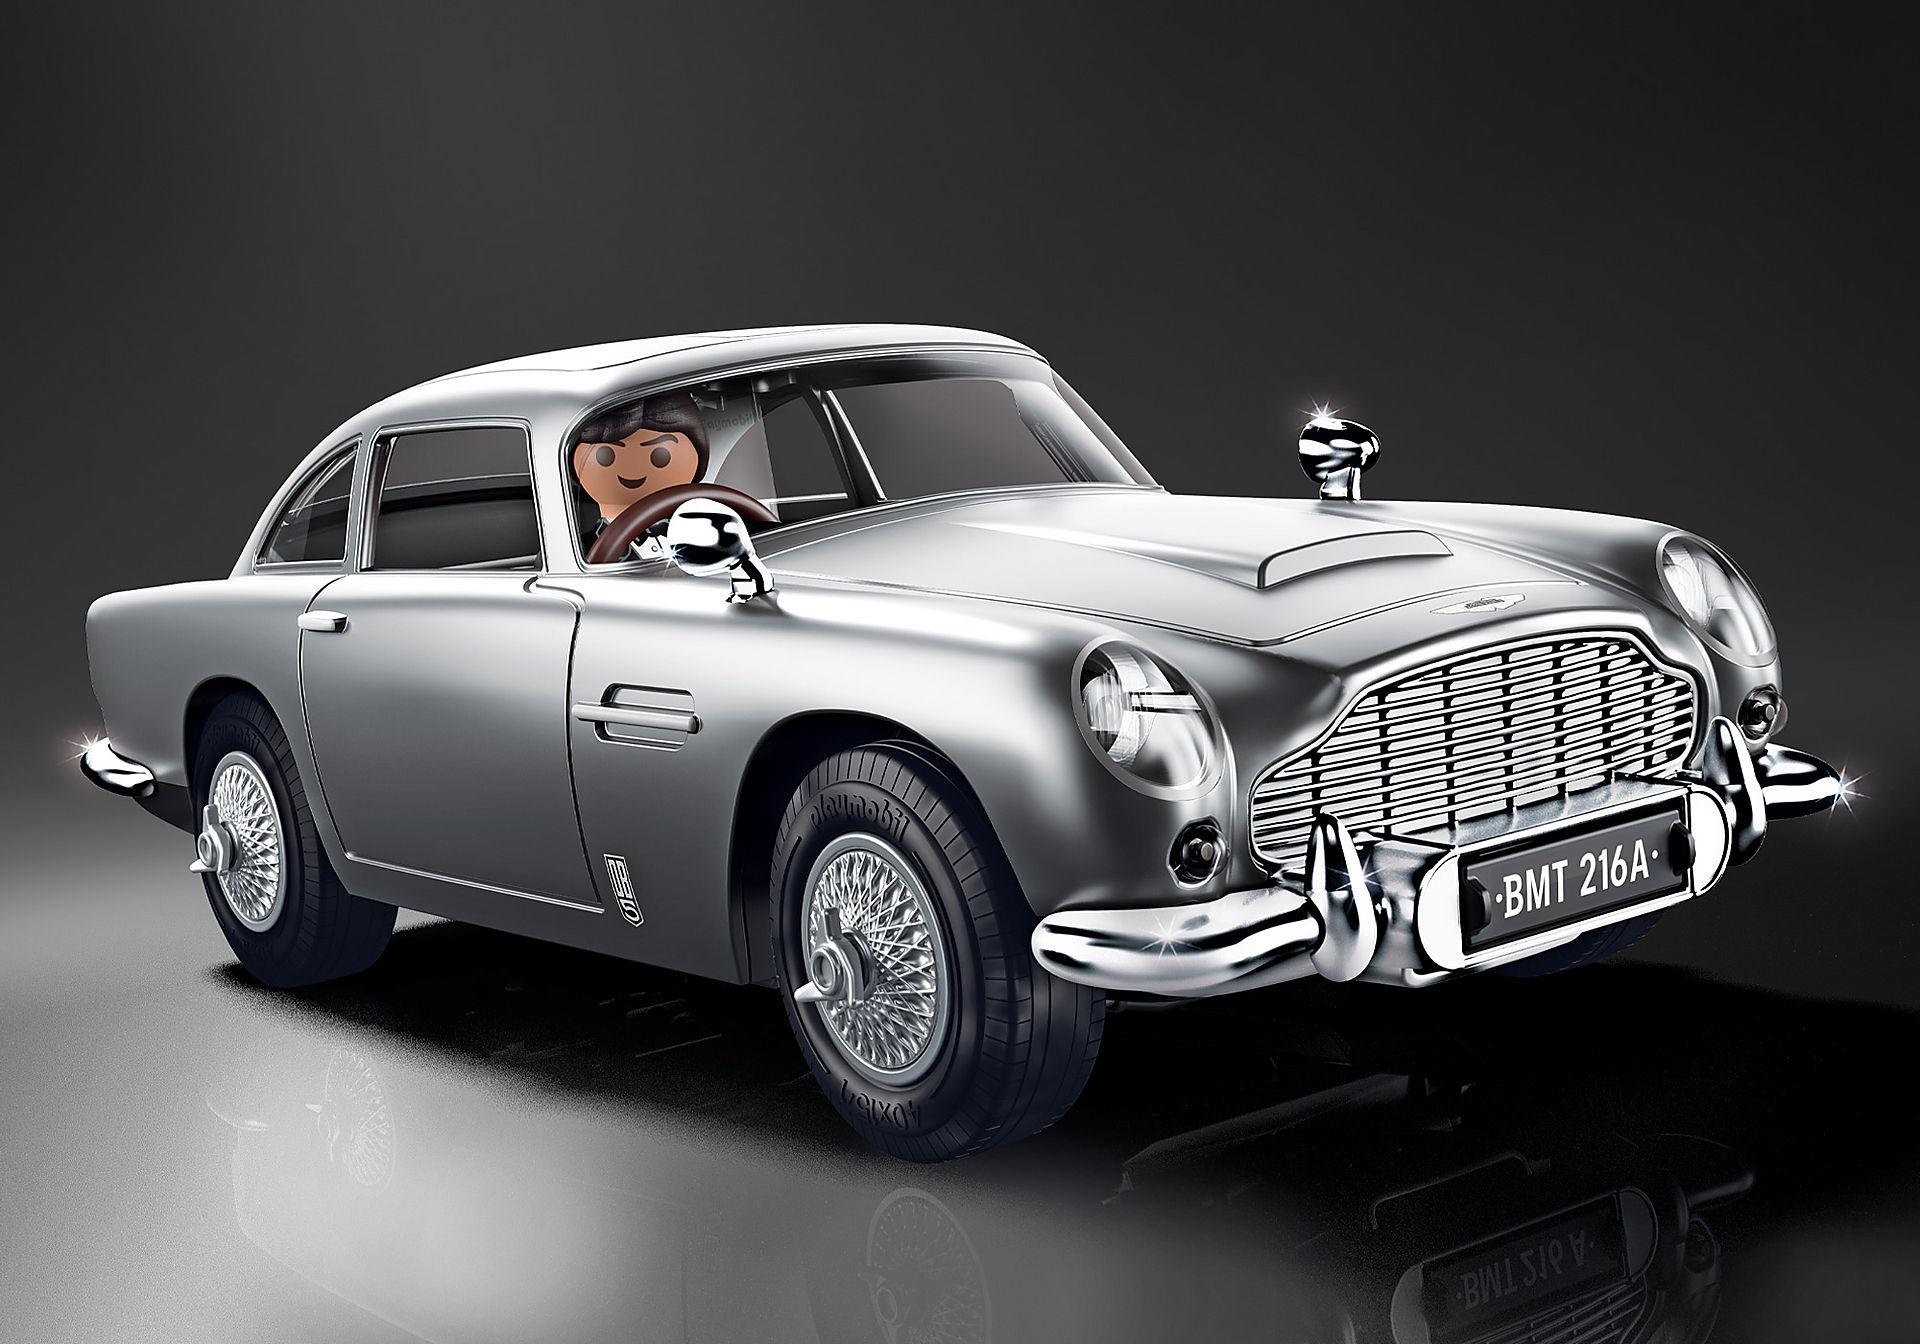 70578 James Bond Aston Martin DB5 - Edition Goldfinger zoom image1